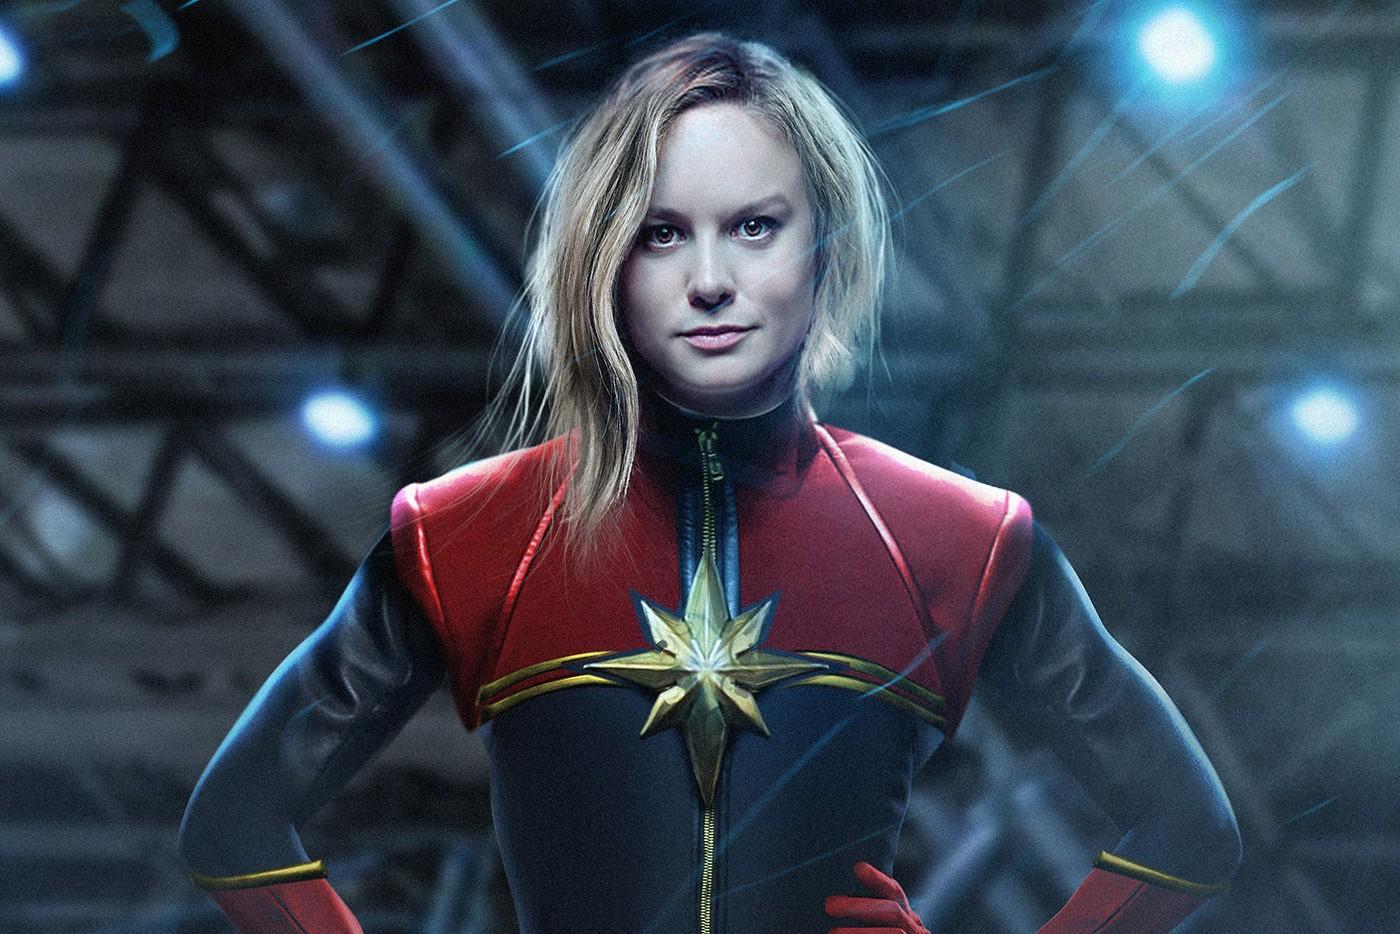 Captain Marvel / Carol Danvers Brie Larson)